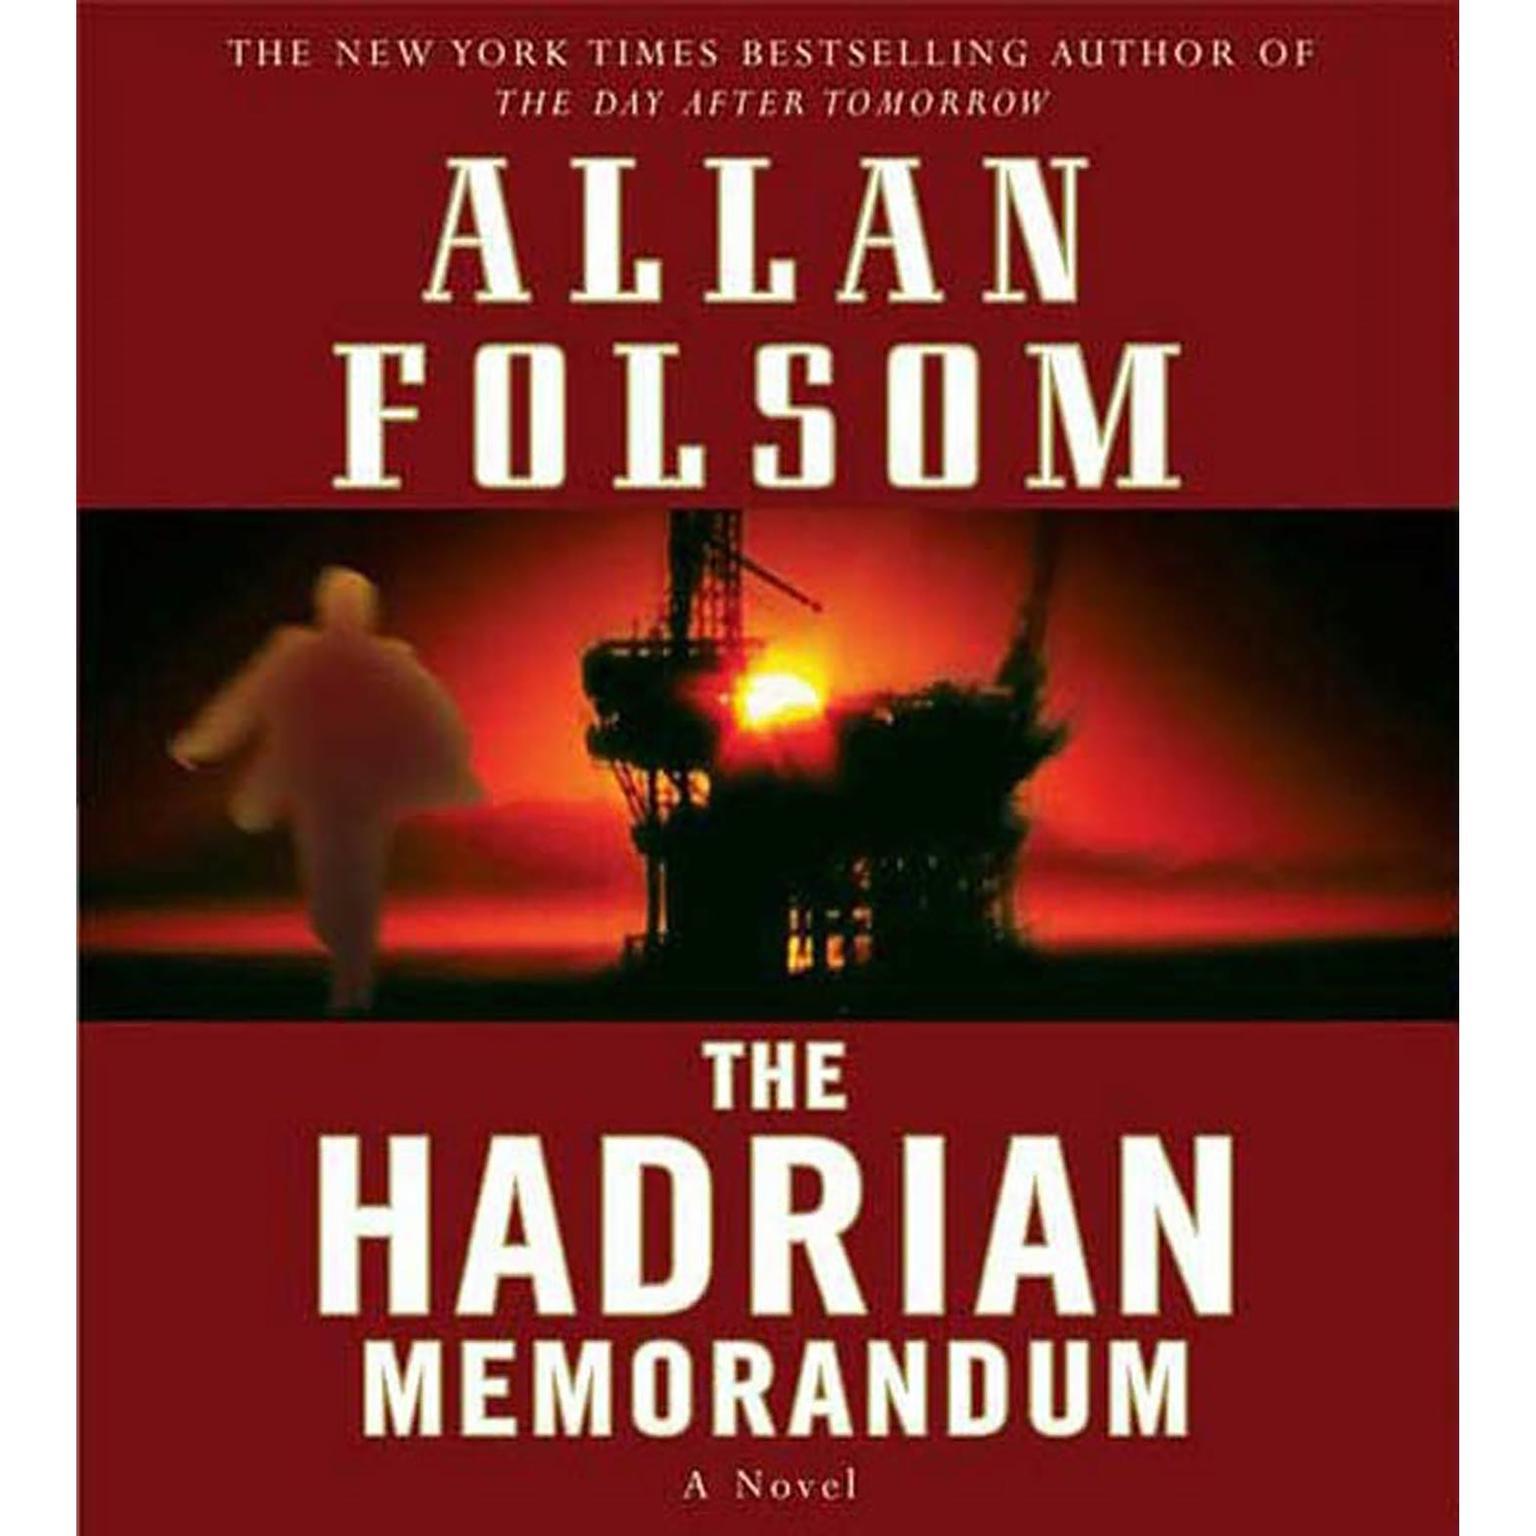 Printable The Hadrian Memorandum: A Novel Audiobook Cover Art